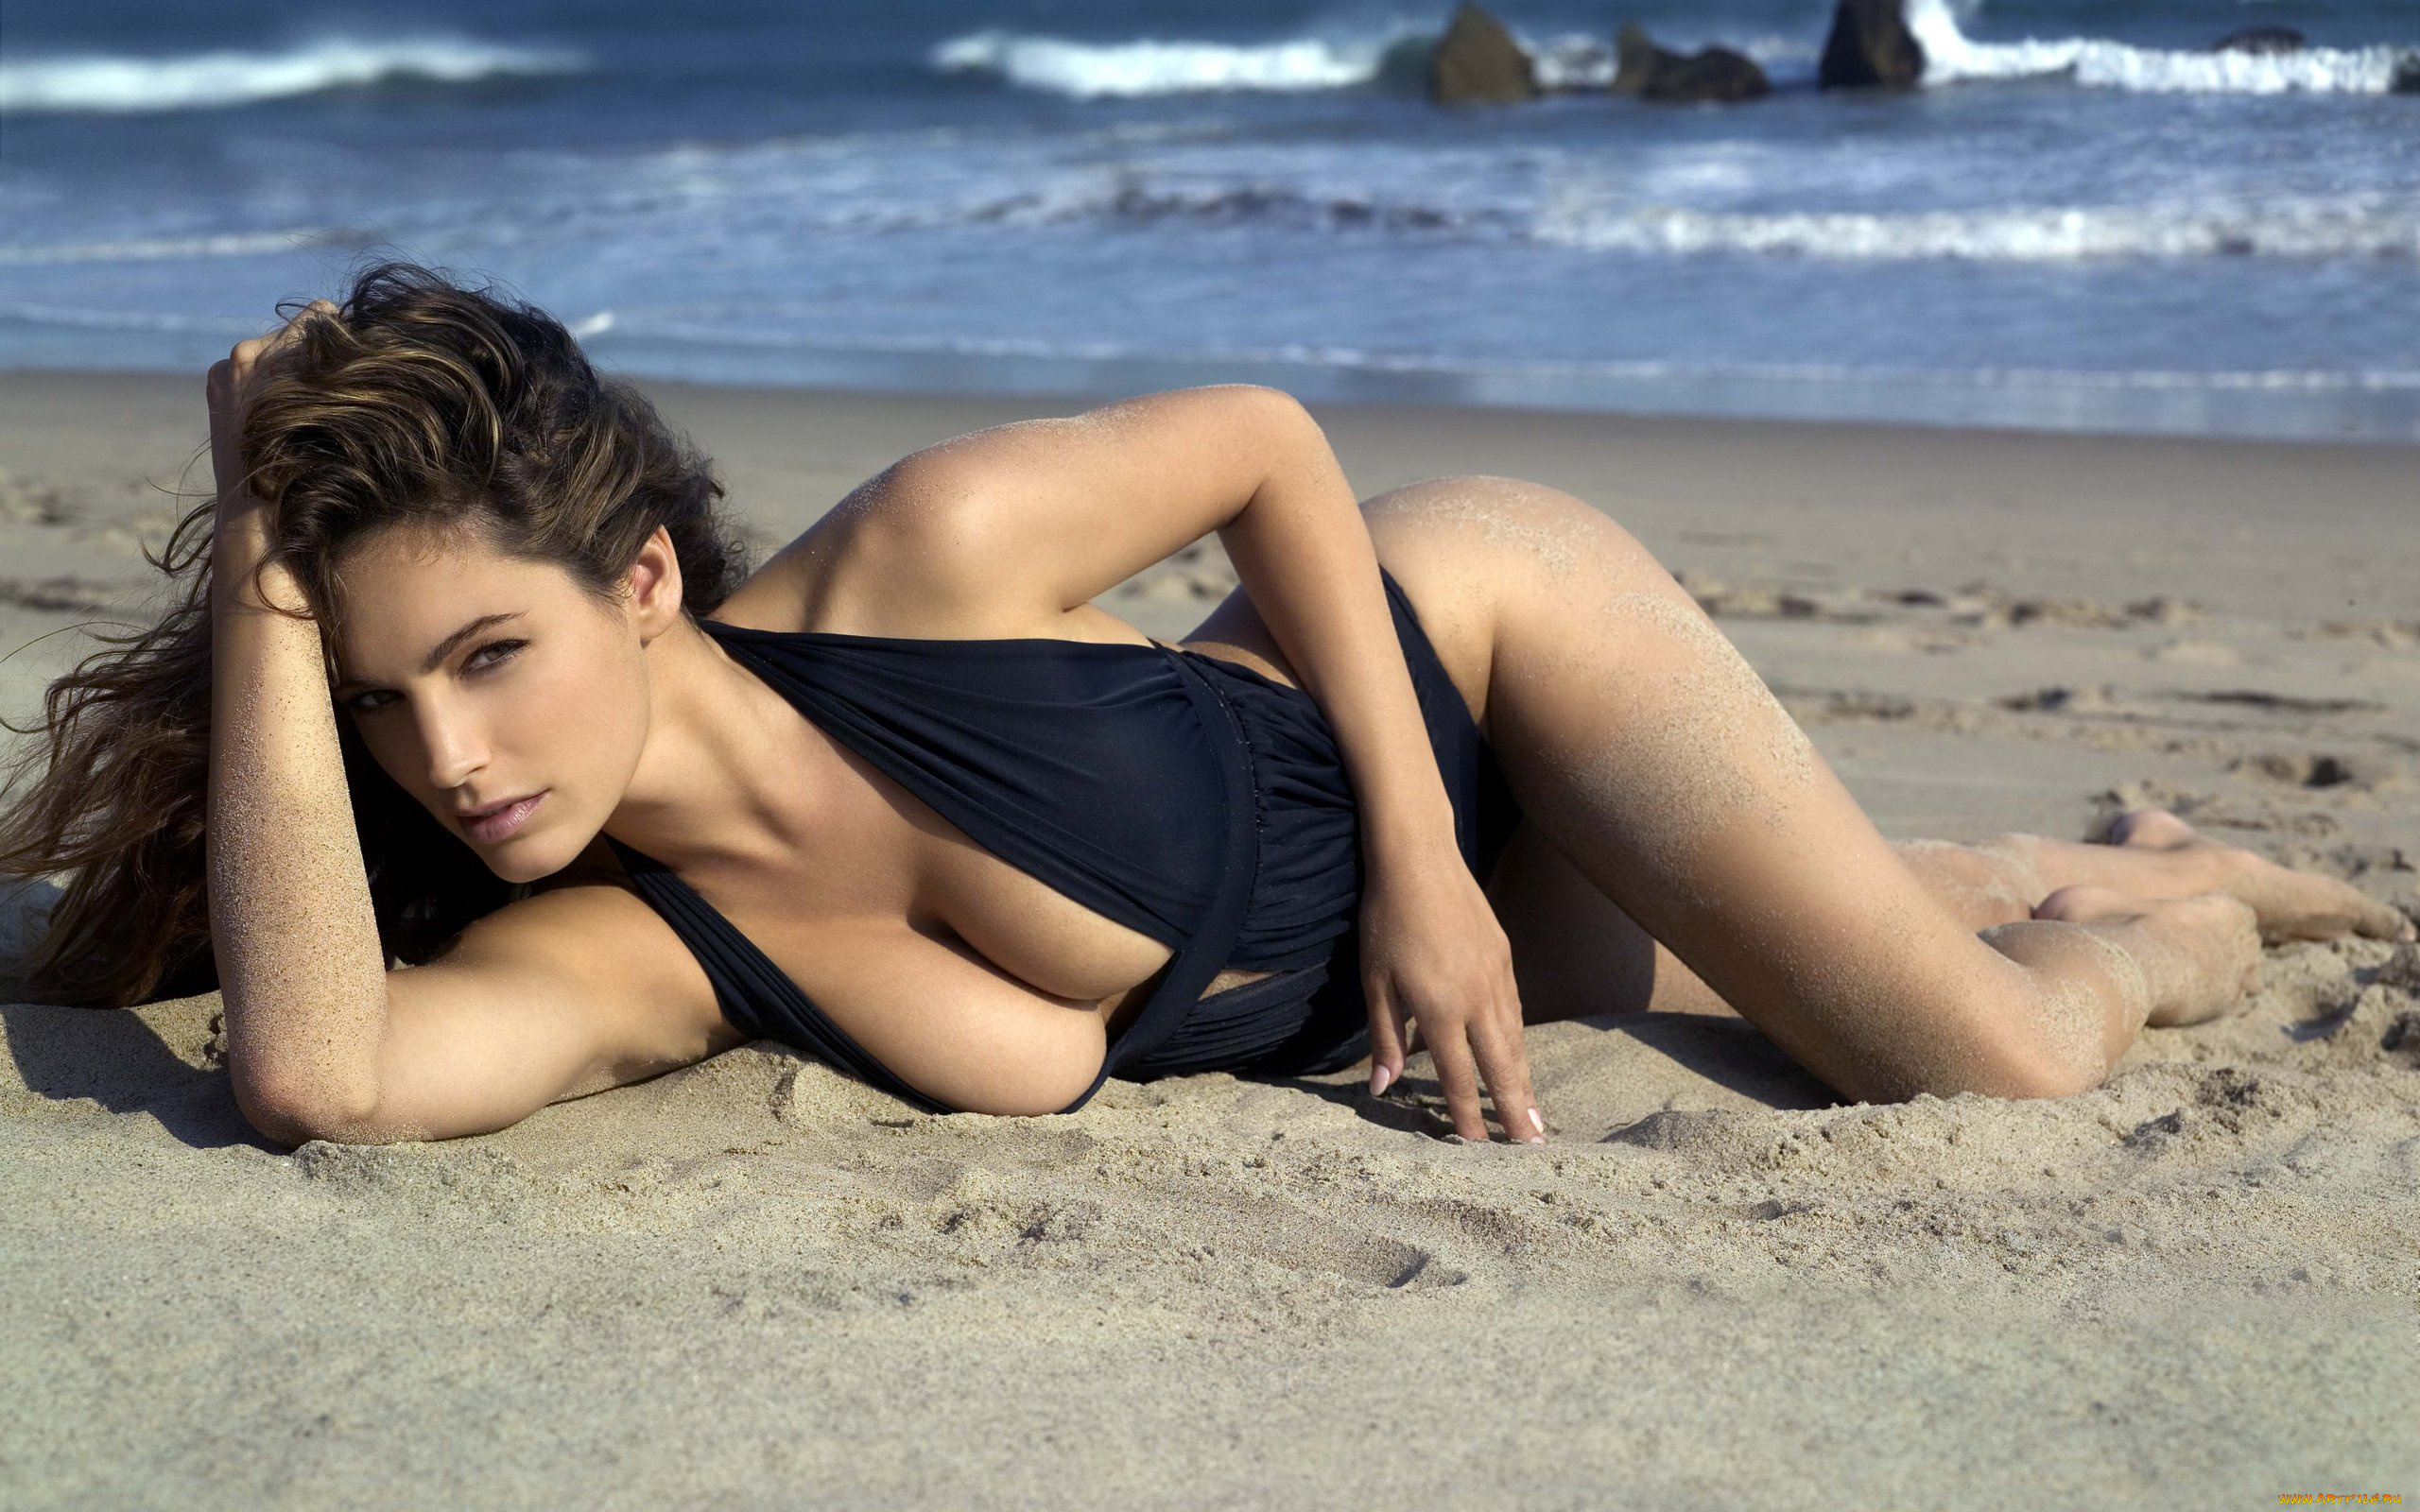 Видео девушек с пляжа вкусно